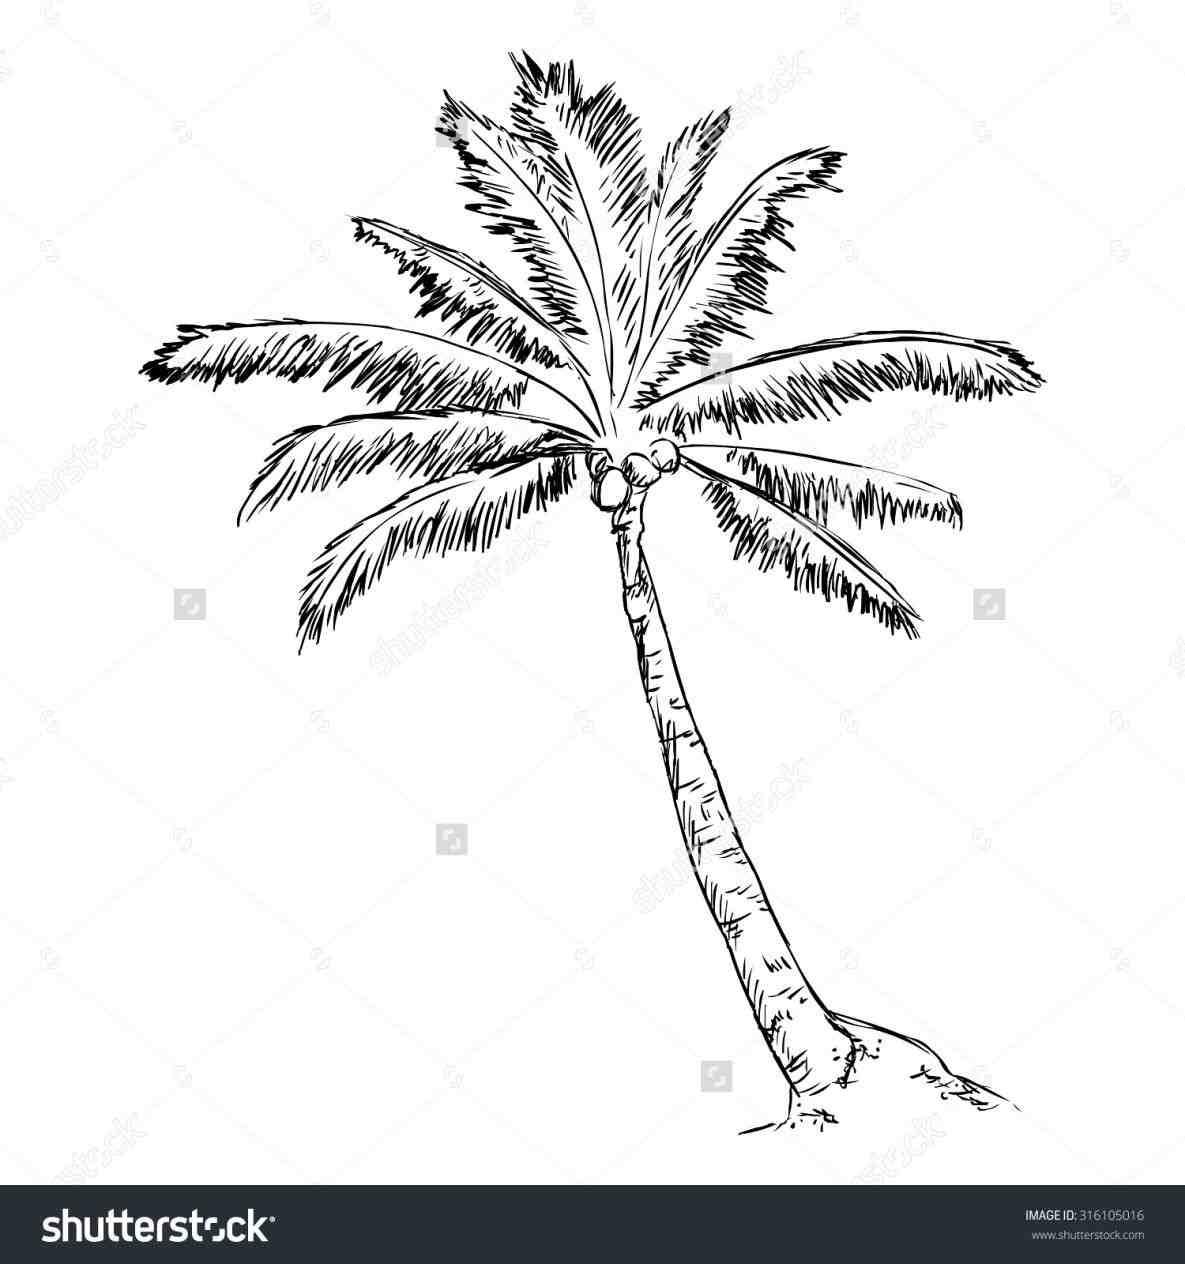 1185x1264 Palm Tree Drawing